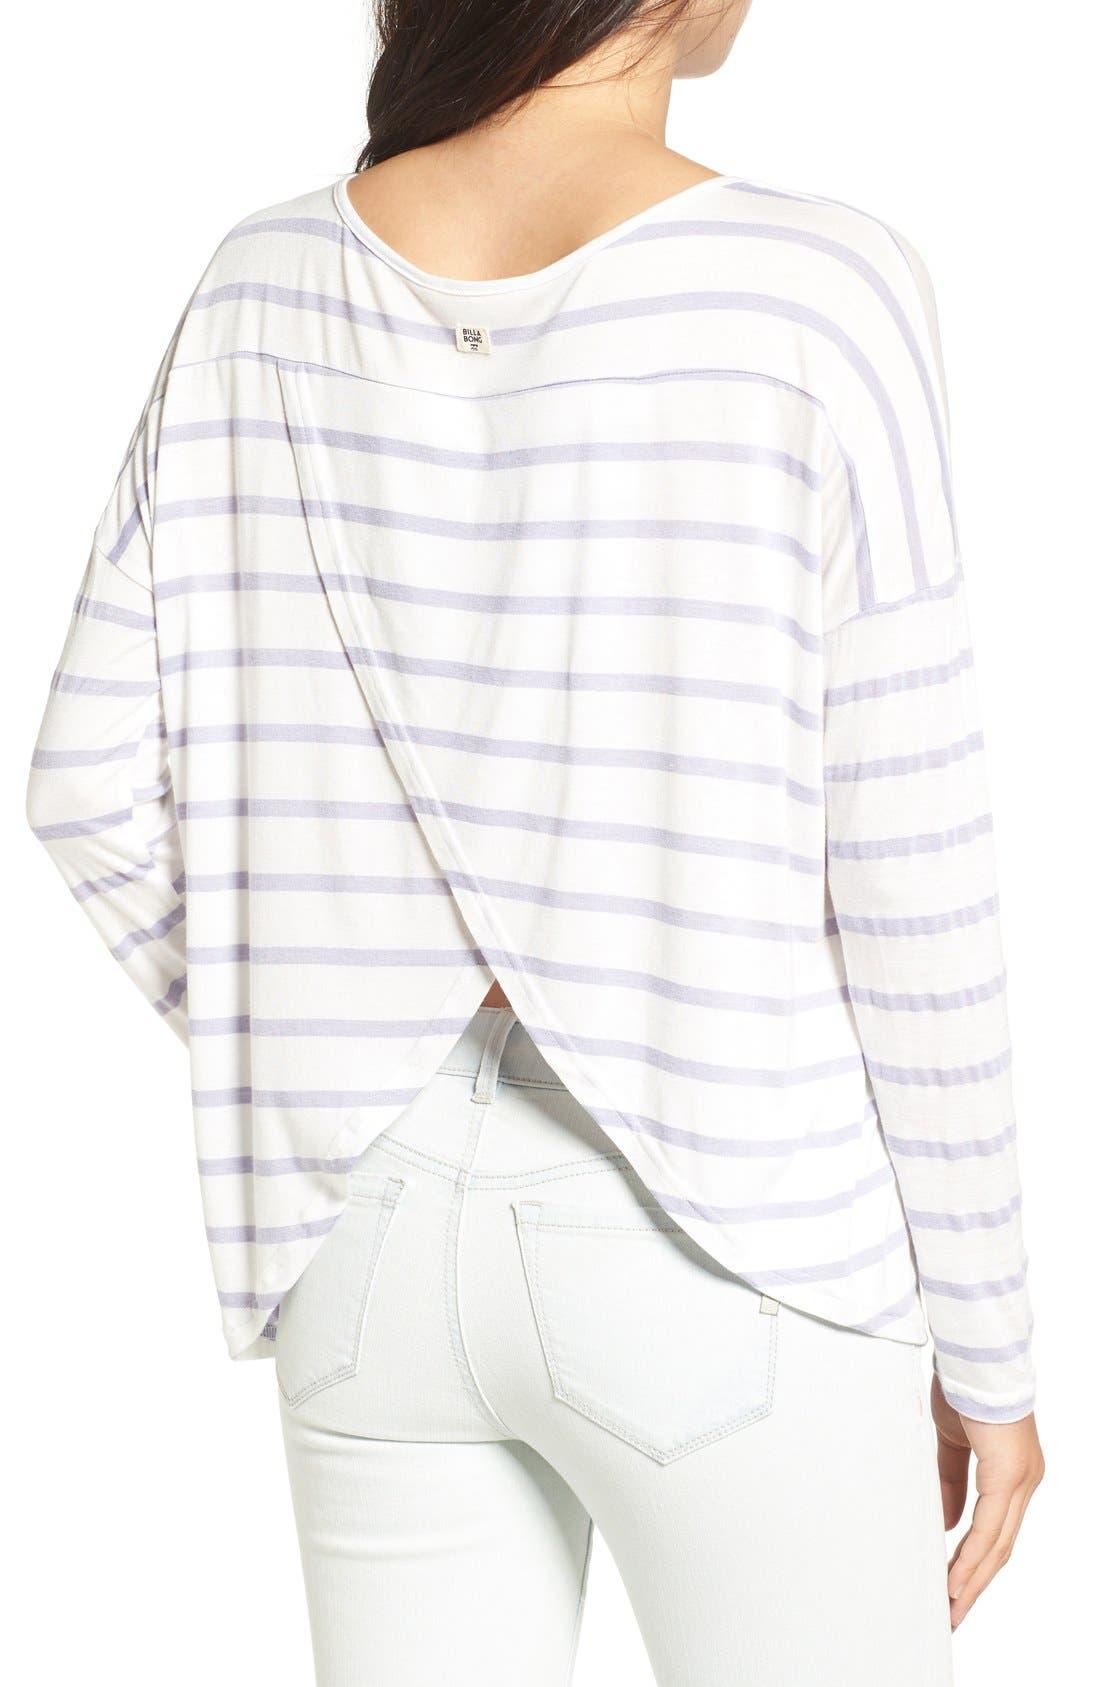 Alternate Image 2  - Billabong 'Change the World' Stripe Long Sleeve Tee